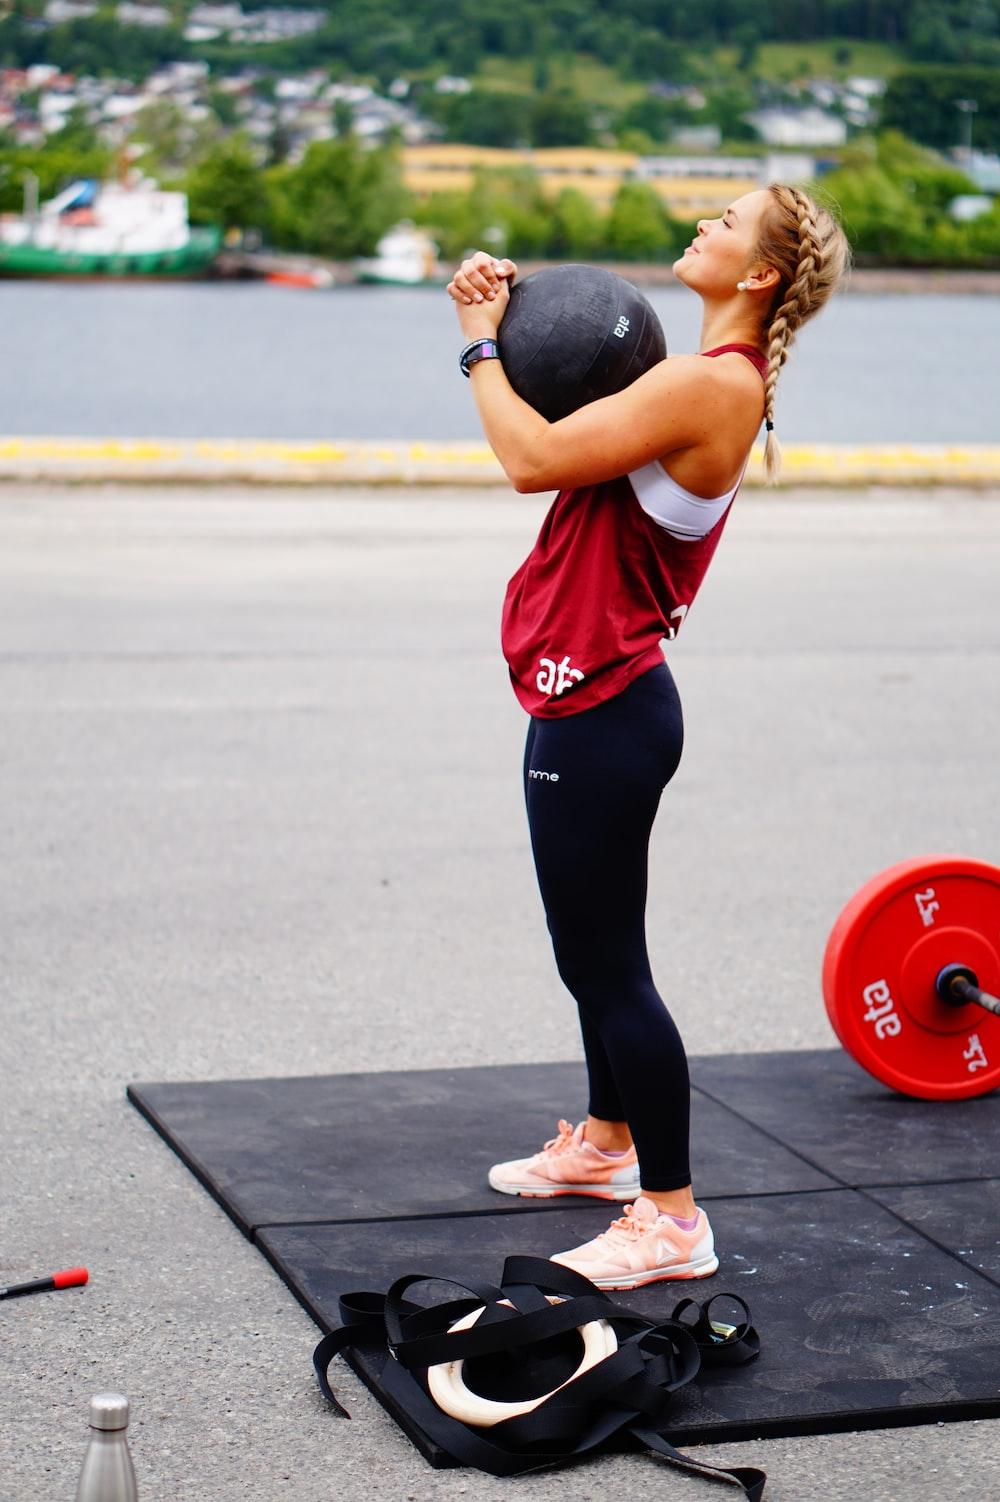 woman doing exercise using medicine ball